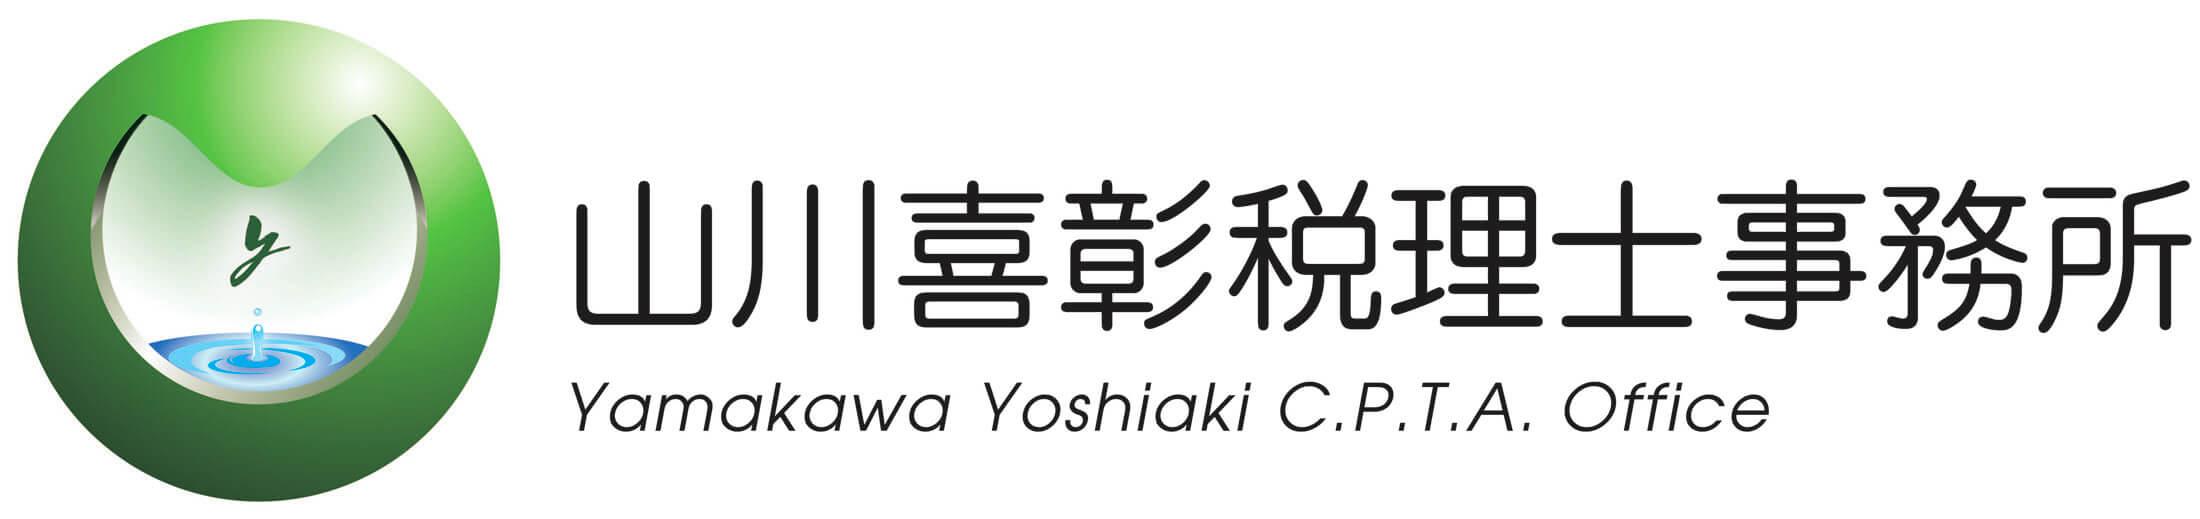 山川事務所ロゴ横型3